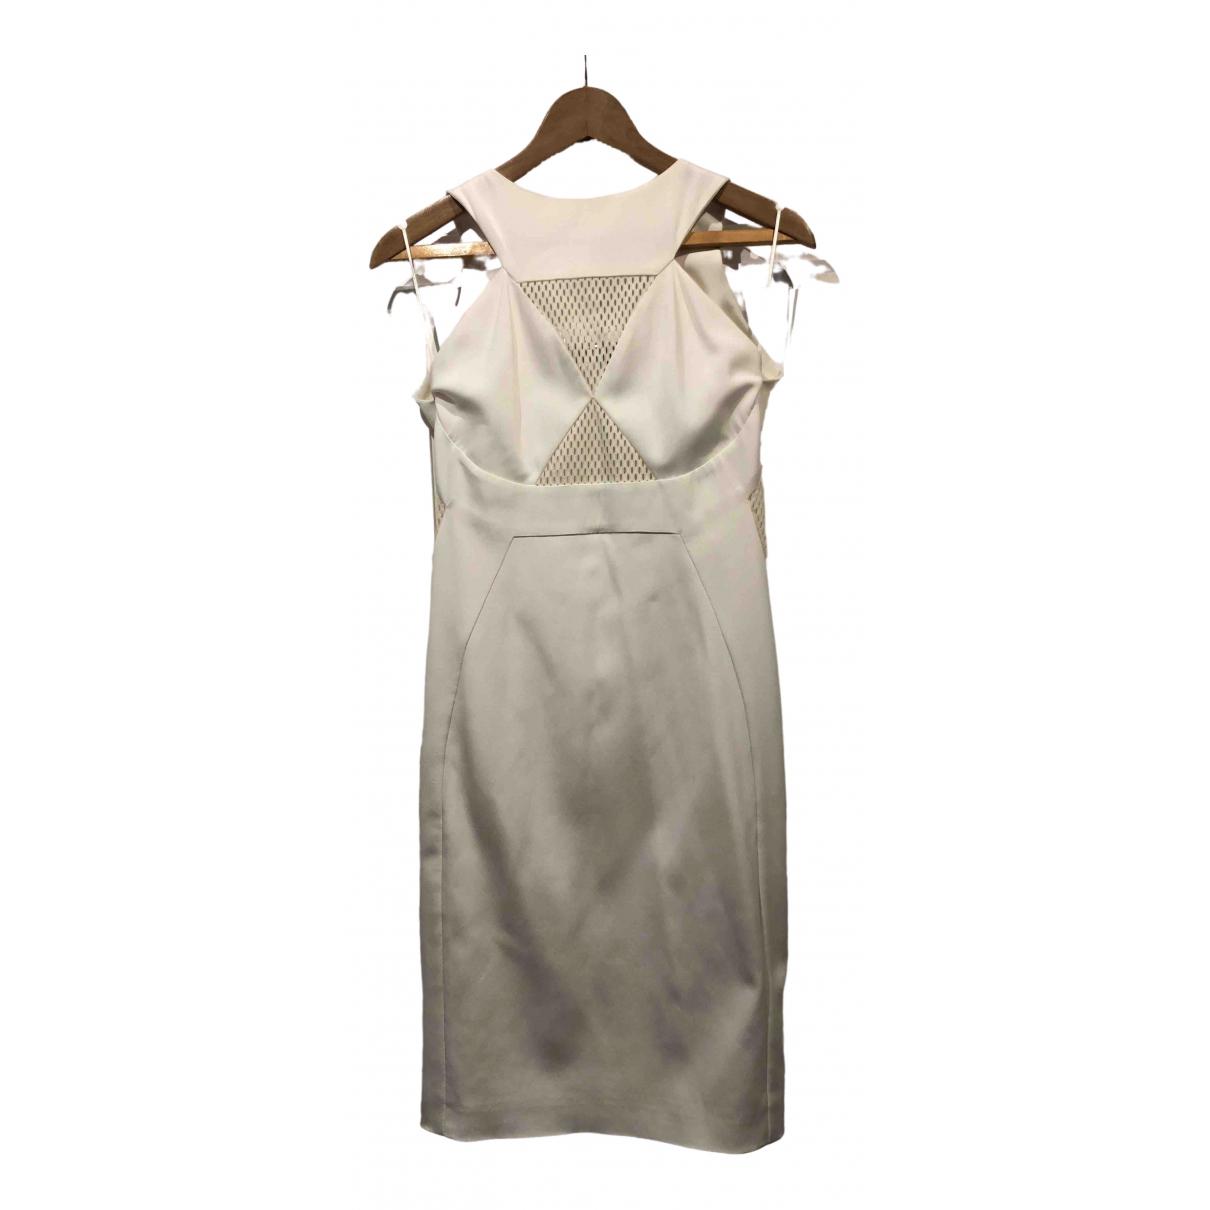 Gucci \N White dress for Women 44 IT